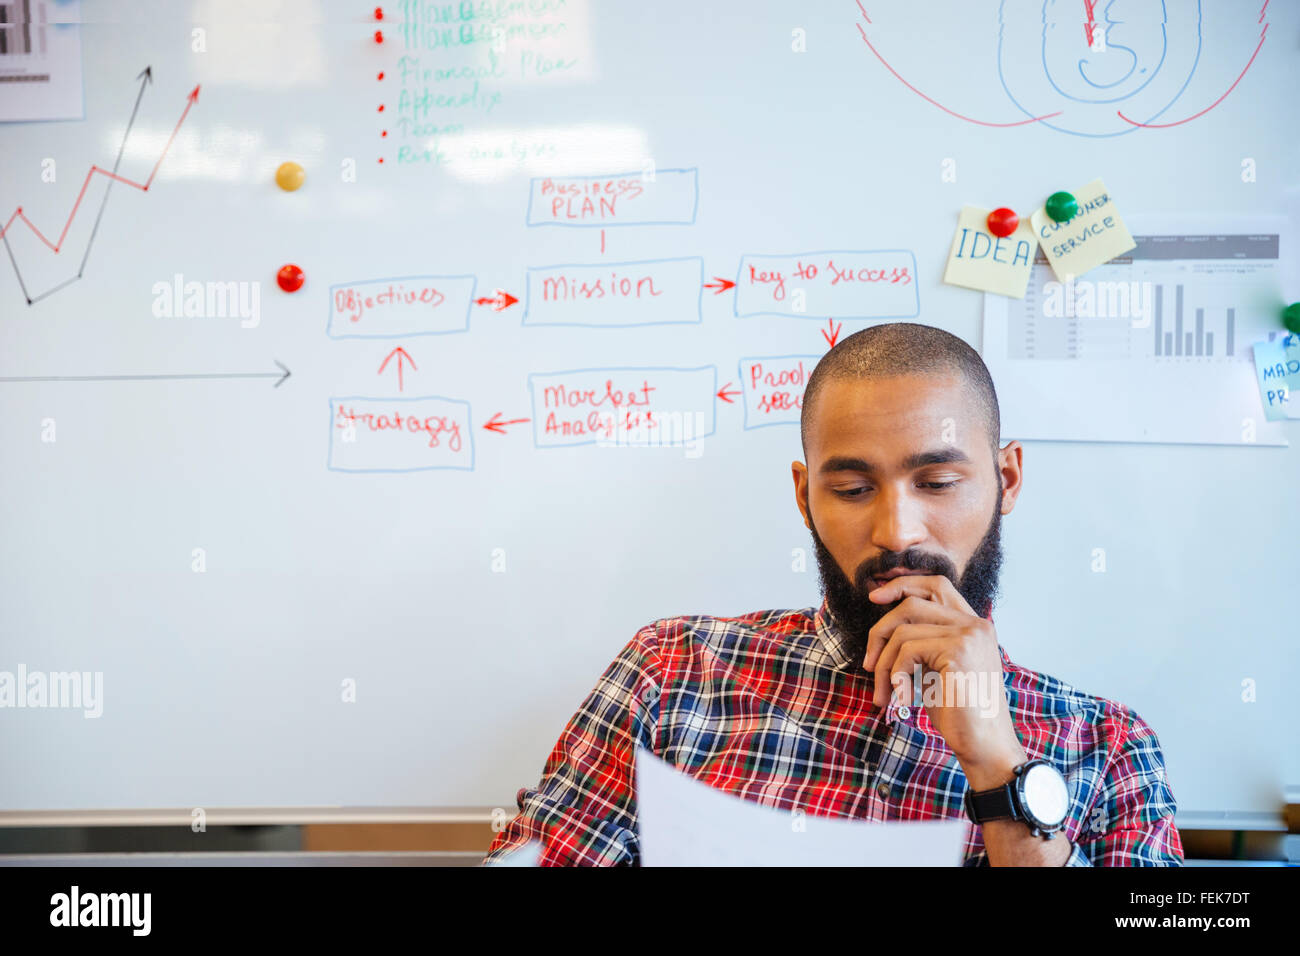 Pensativo joven barbudo hombre afroamericano leyendo sentado sobre pizarra Imagen De Stock